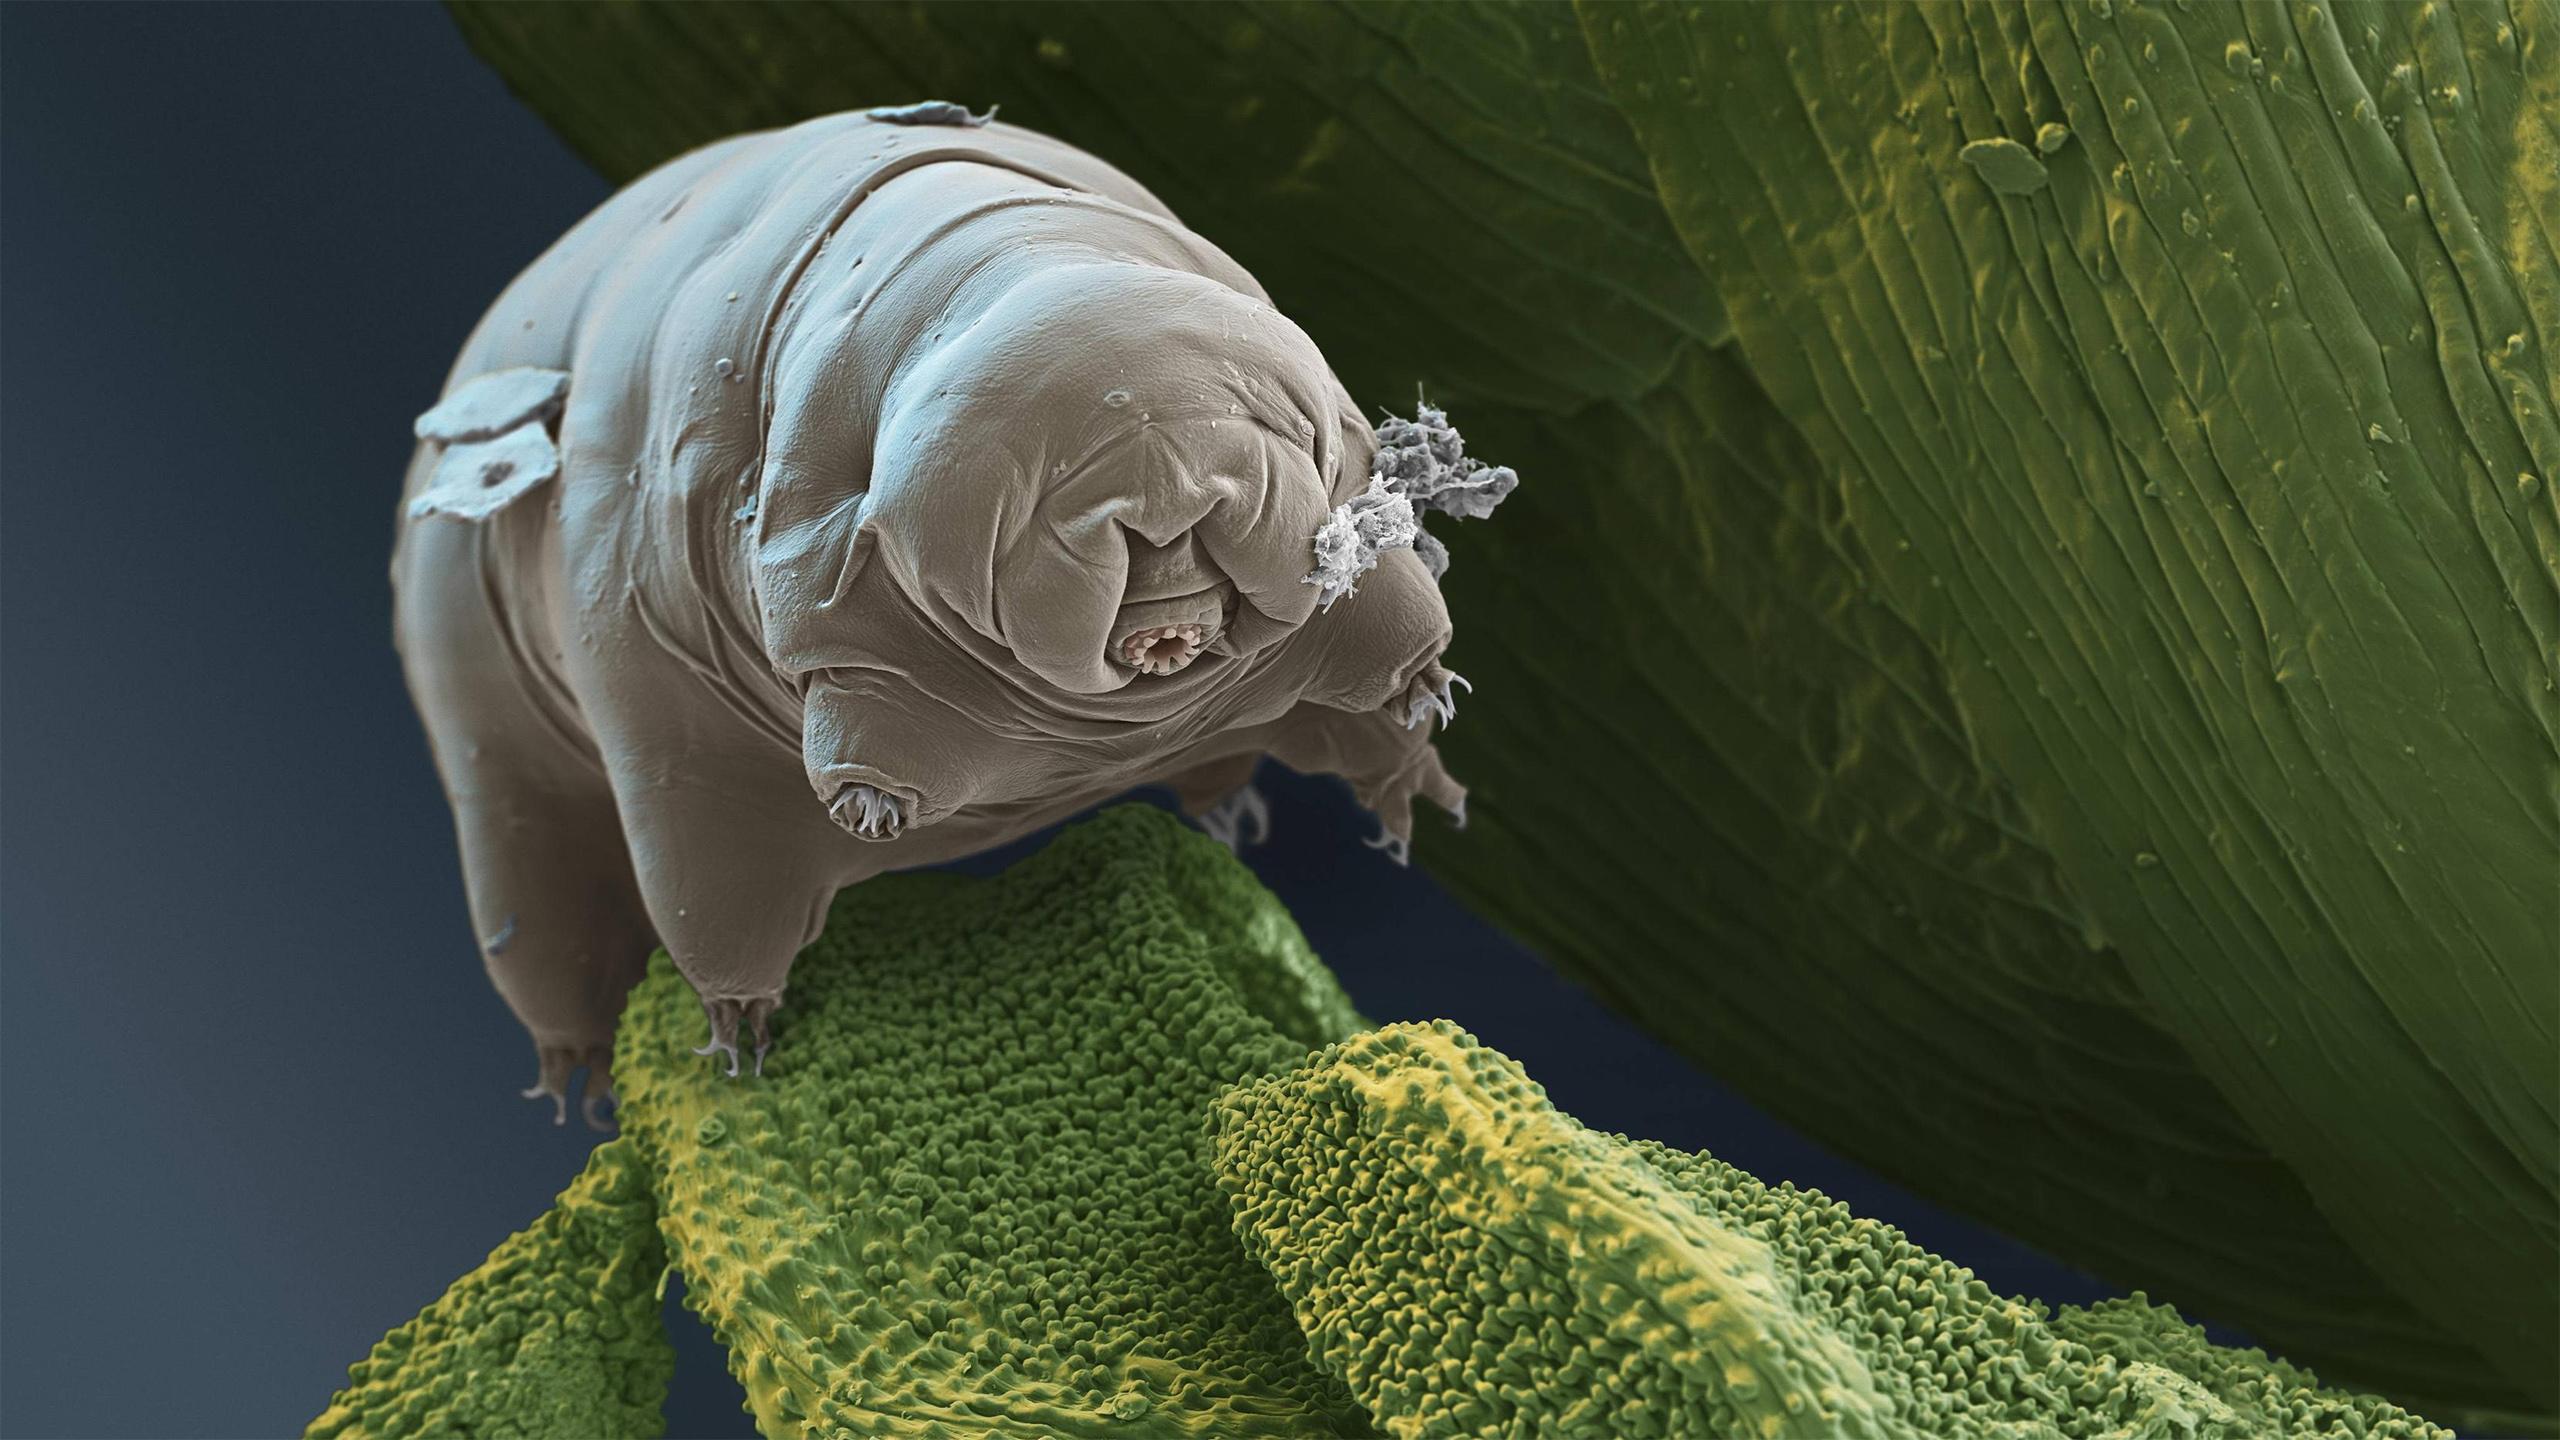 Electron microscope picture of a Tardigrade iimgurcom 2560x1440